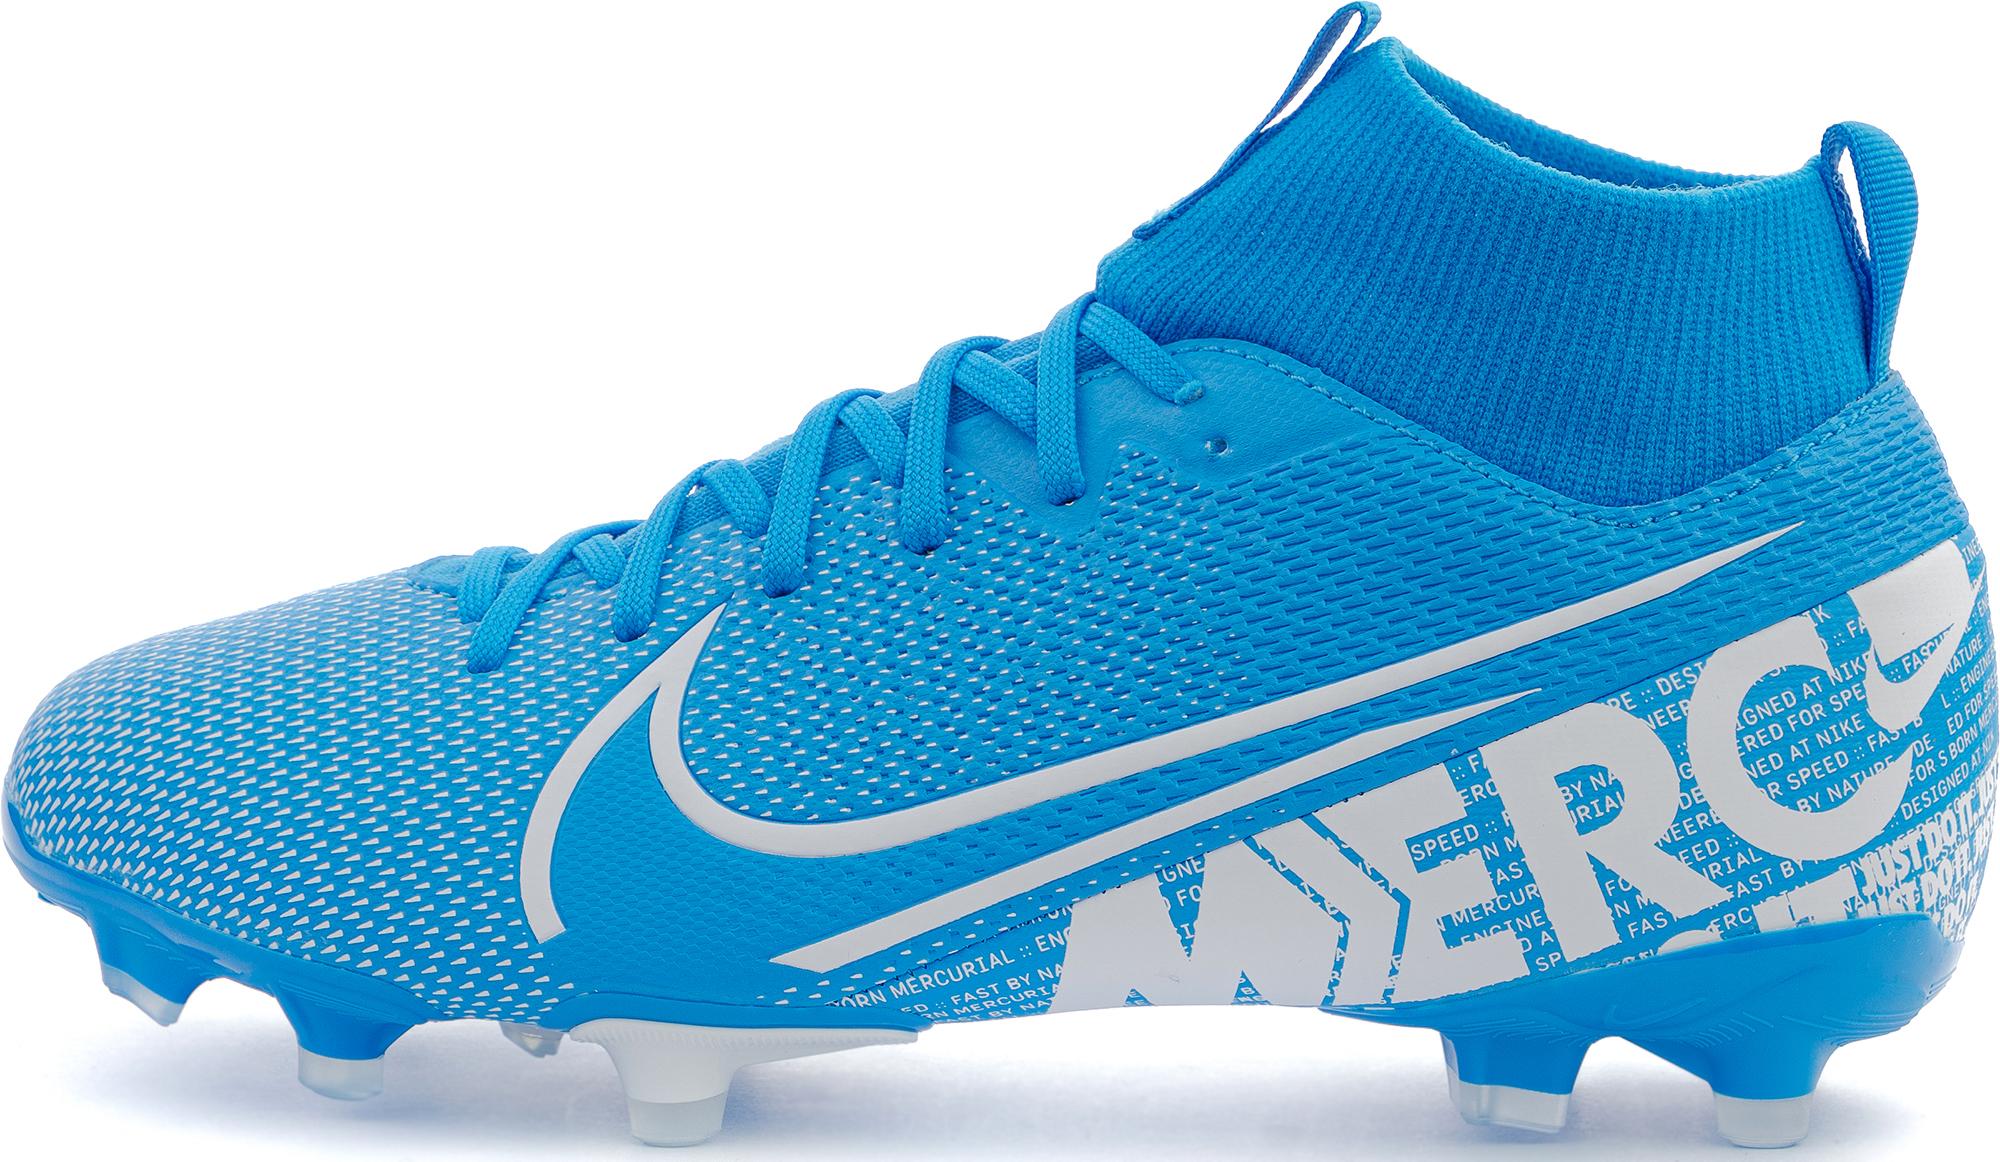 Nike Бутсы детские Jr Superfly 7 Academy FG/MG, размер 35